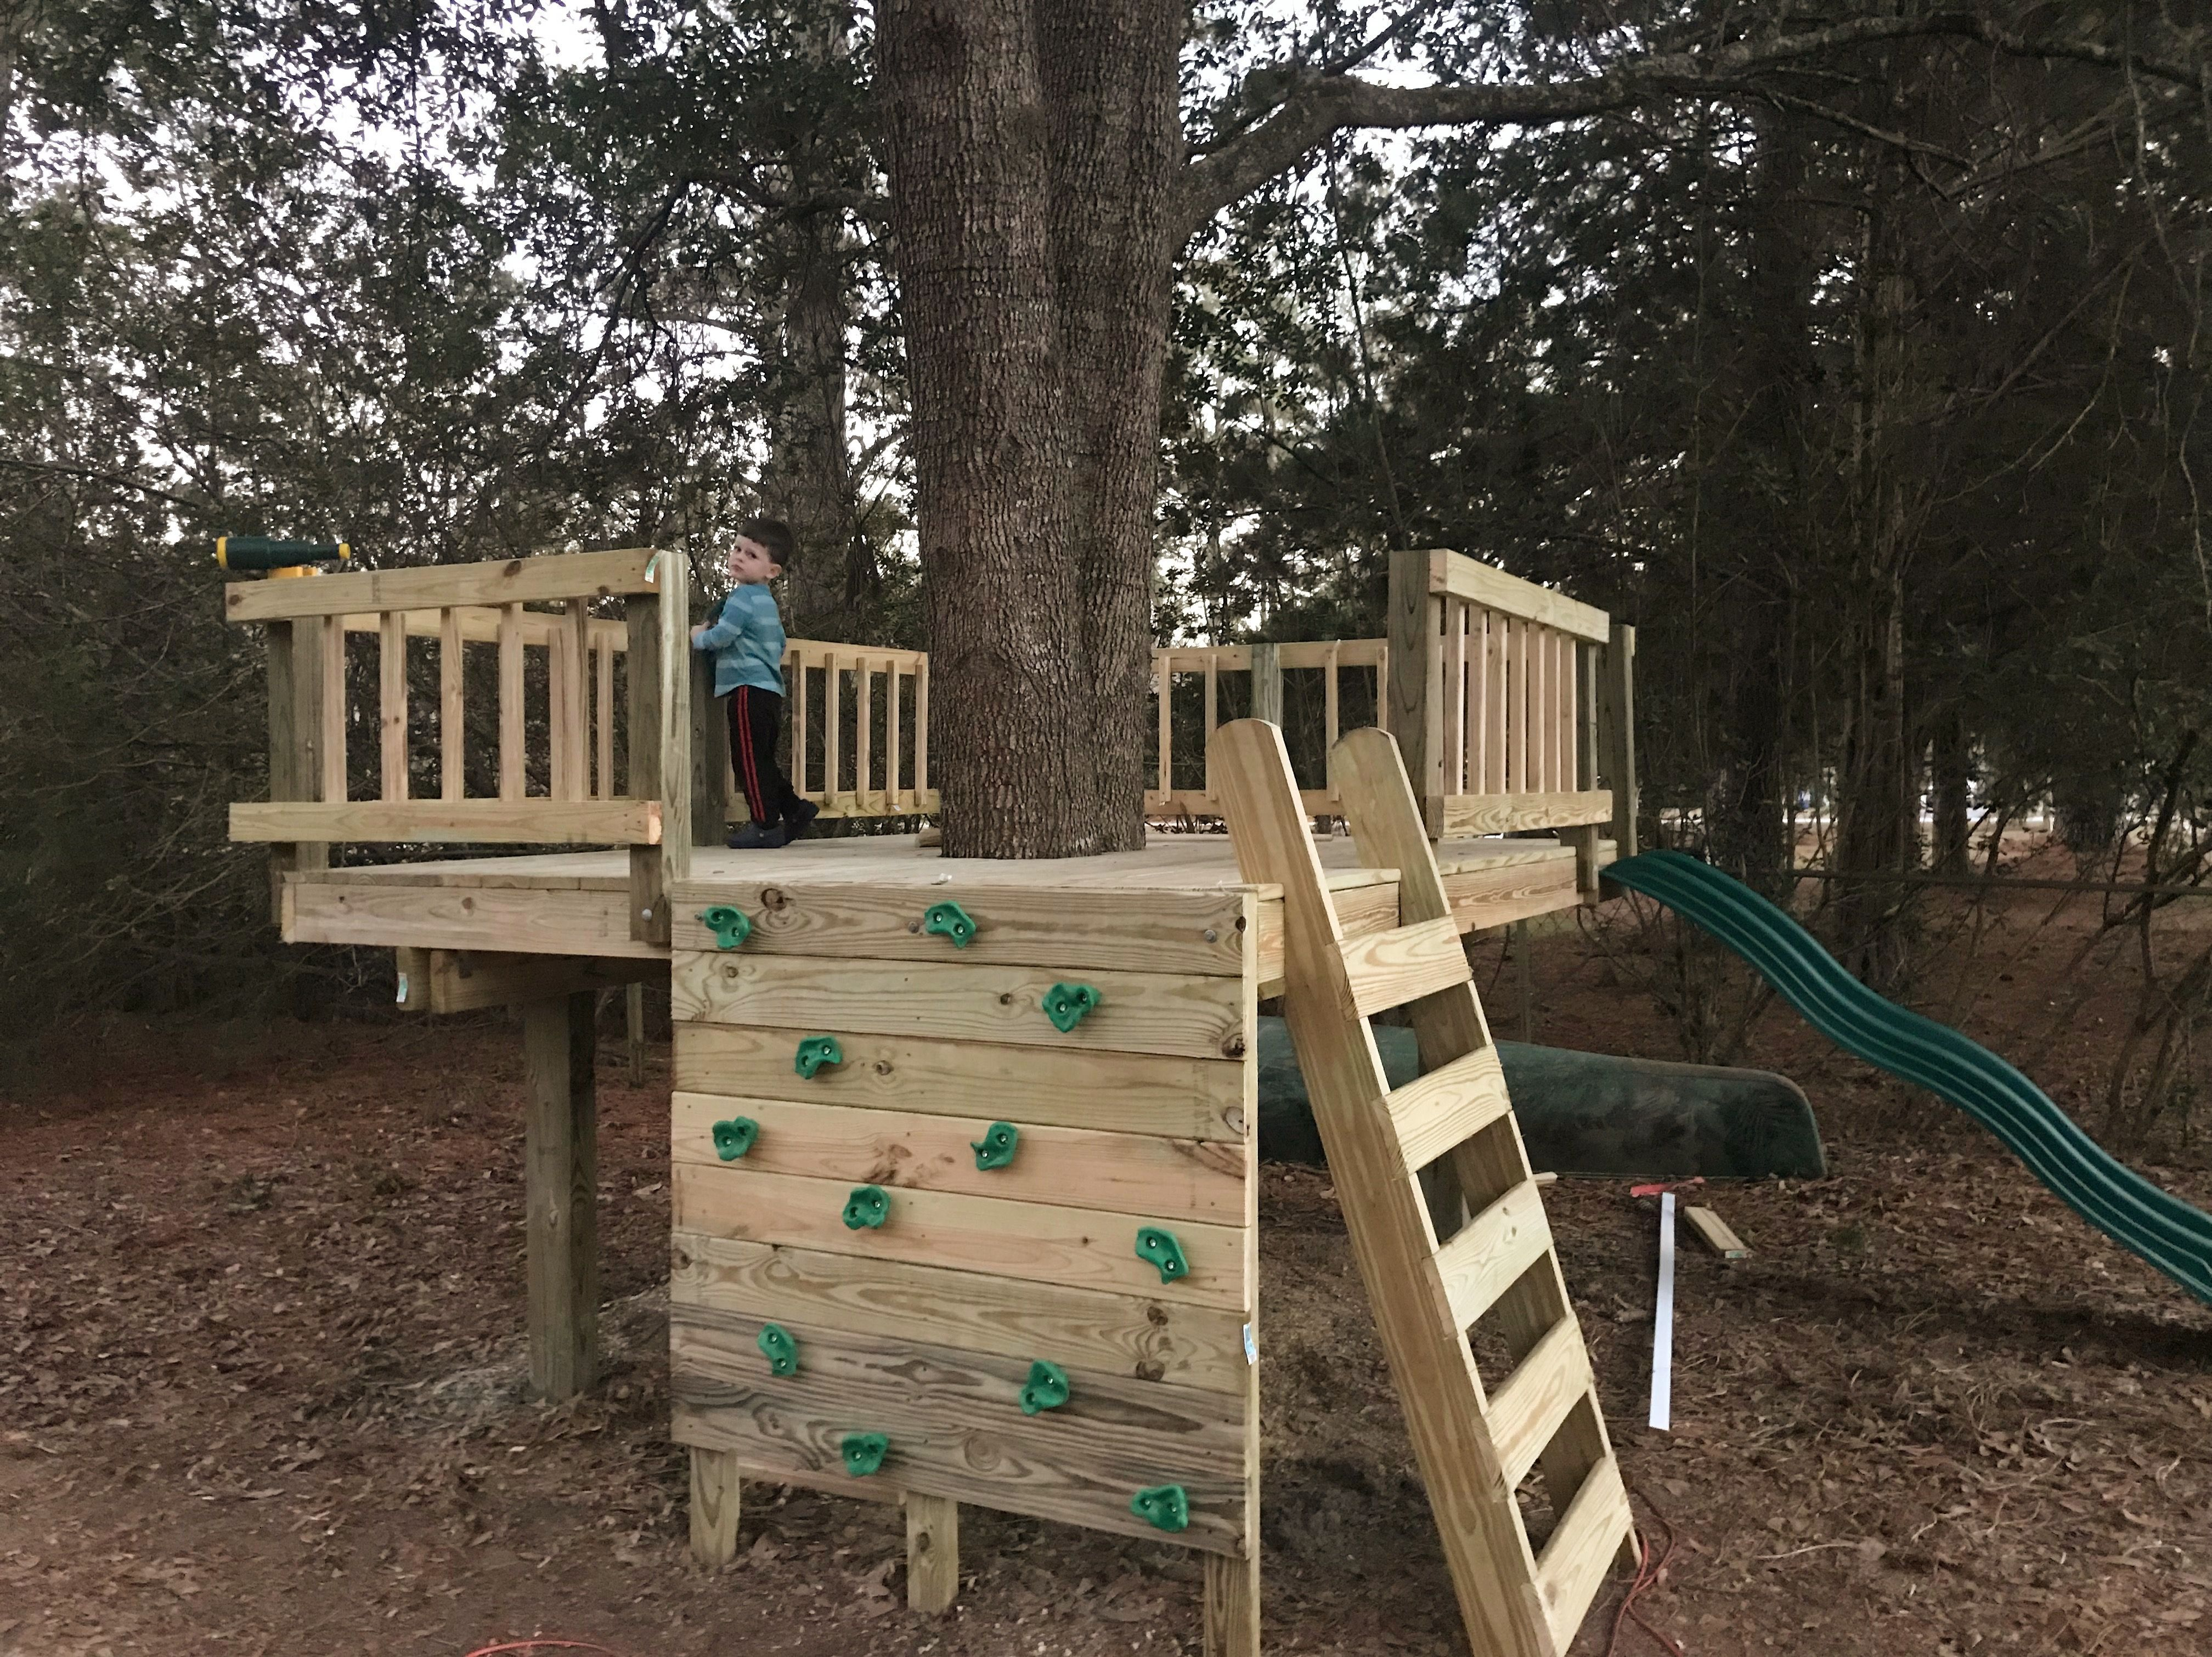 Diy Tree Fort Kids Rock Wall Tree House Railing Play Set For Our One Big Tre Tree House Diy Tree House Kids Backyard Play